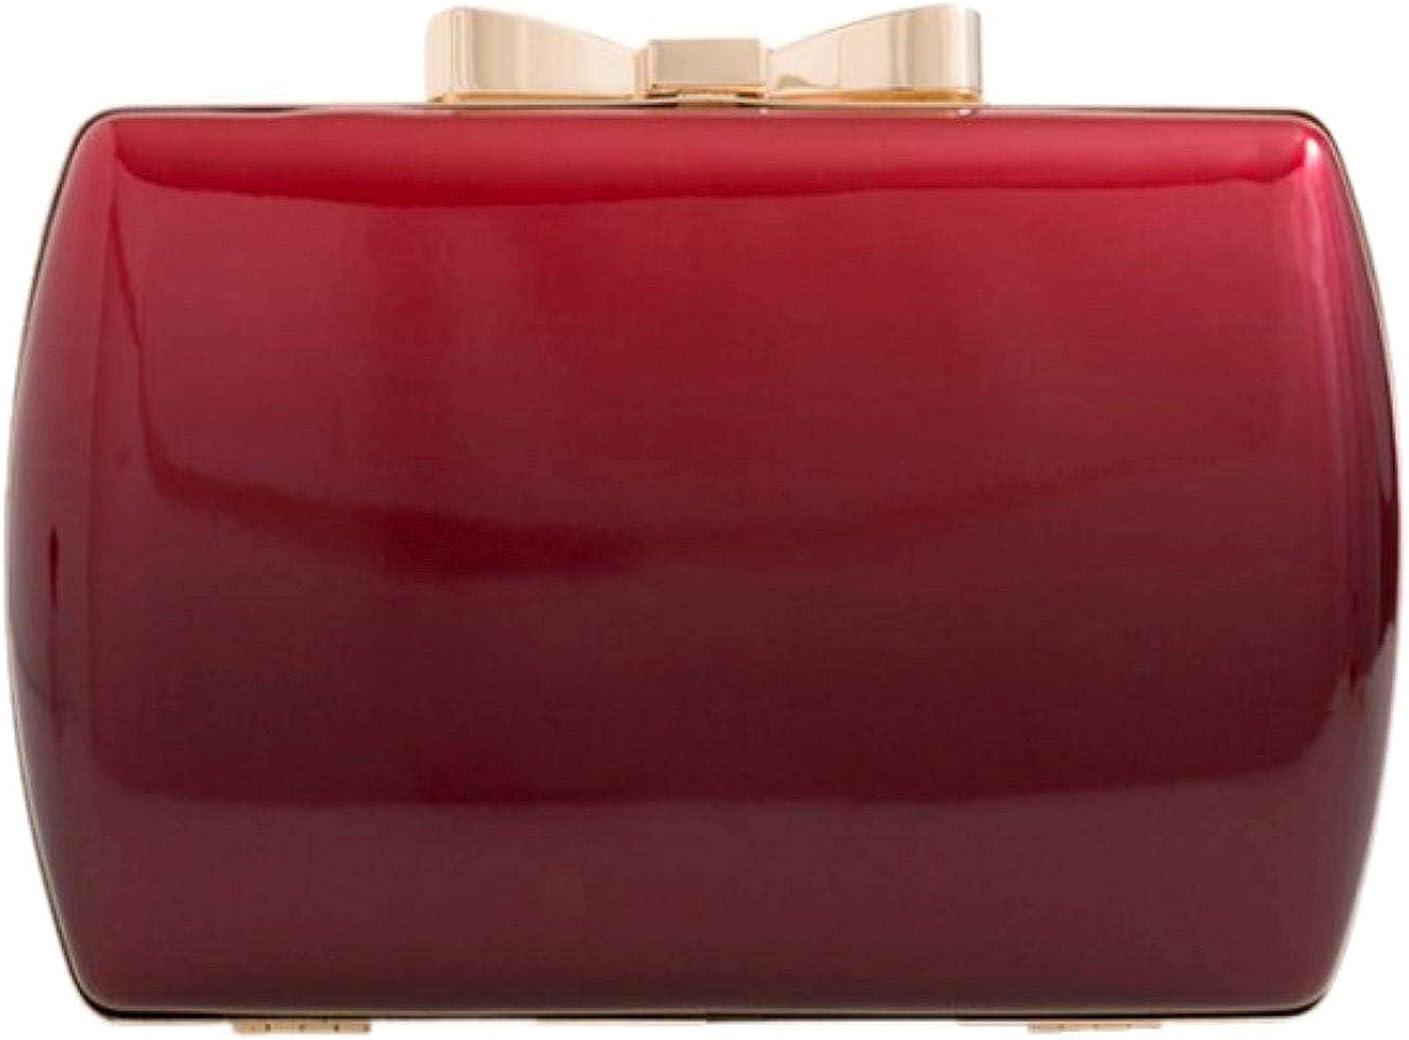 Girly Handbags Womens Glossy Hard Case Clutch Bag